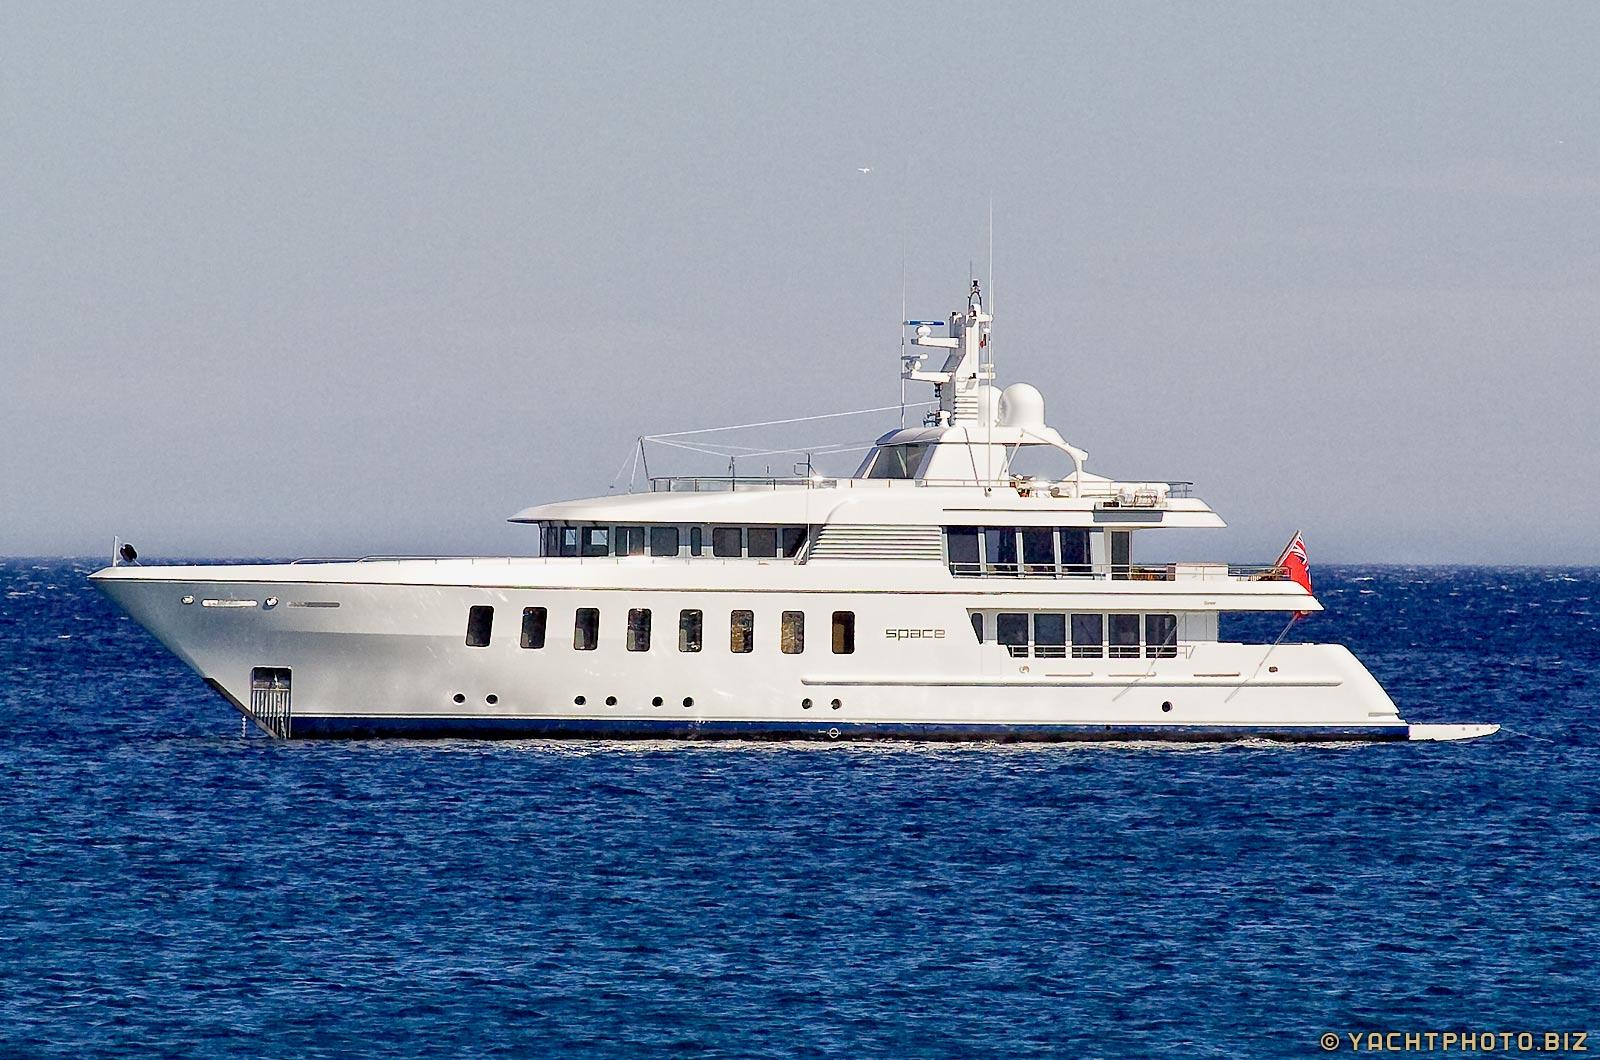 Yacht Photography | Monaco | French Riviera